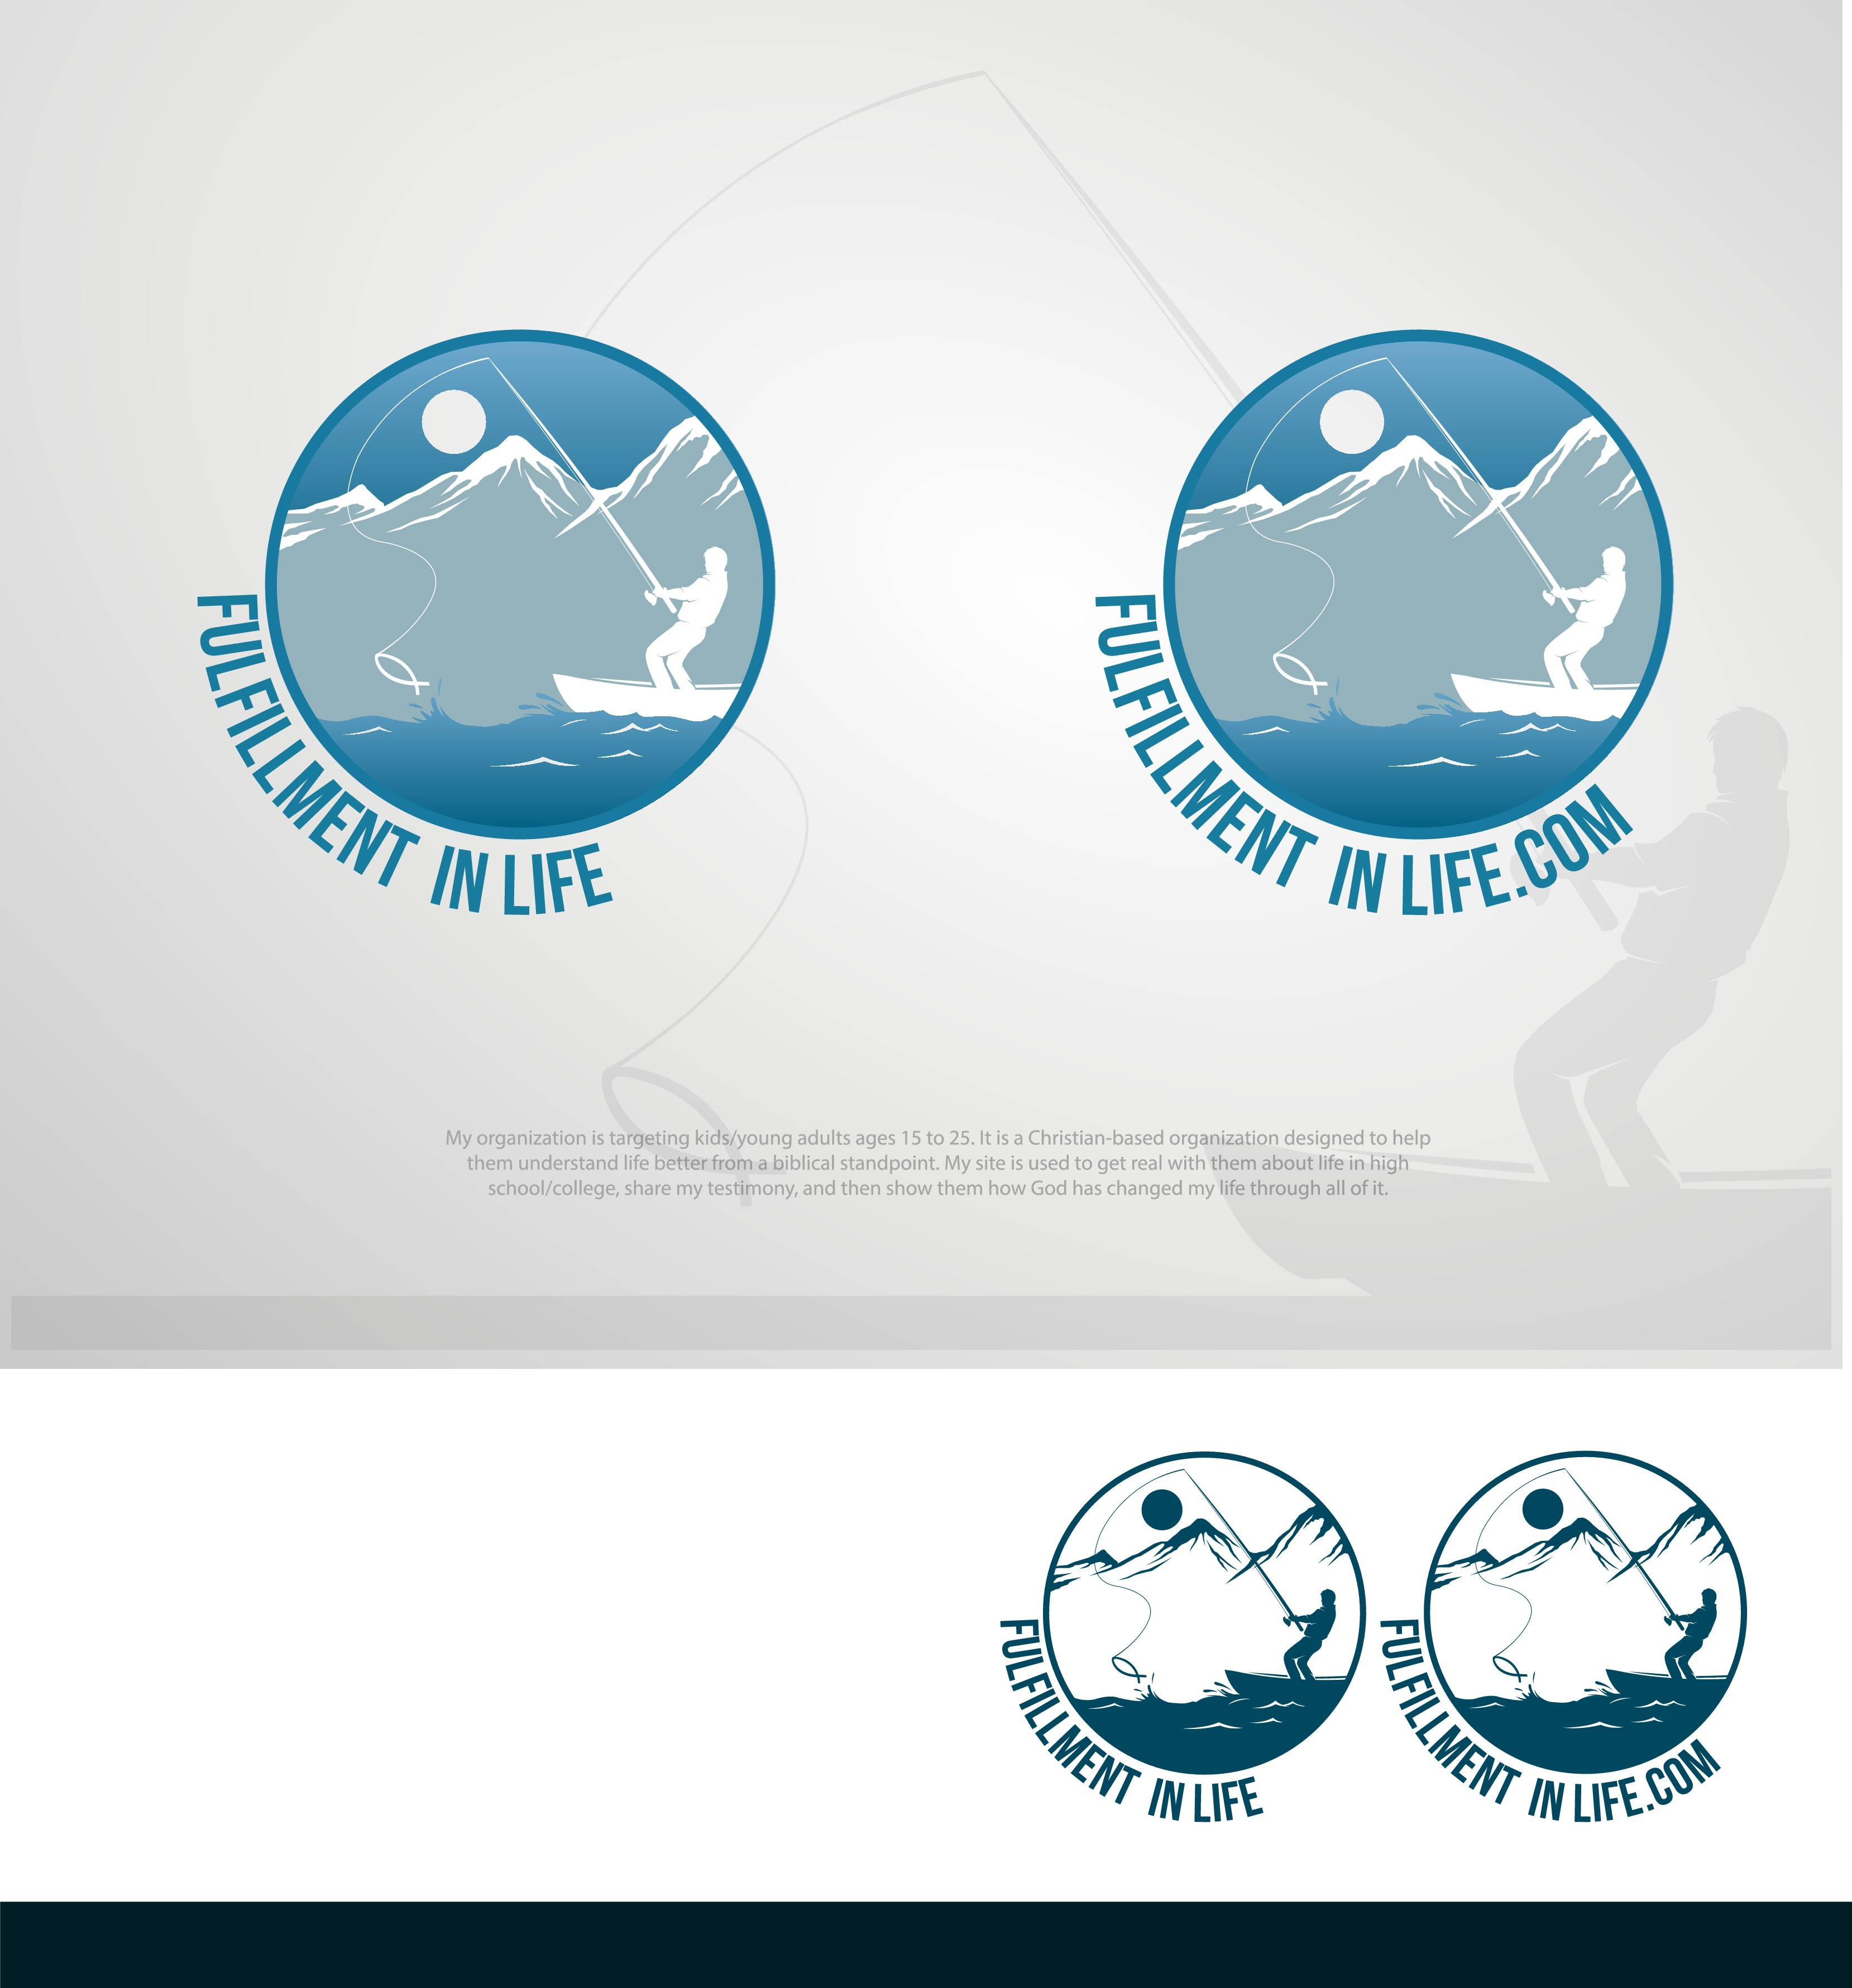 Create a beautiful, clean design logo for Fulfillment in Life